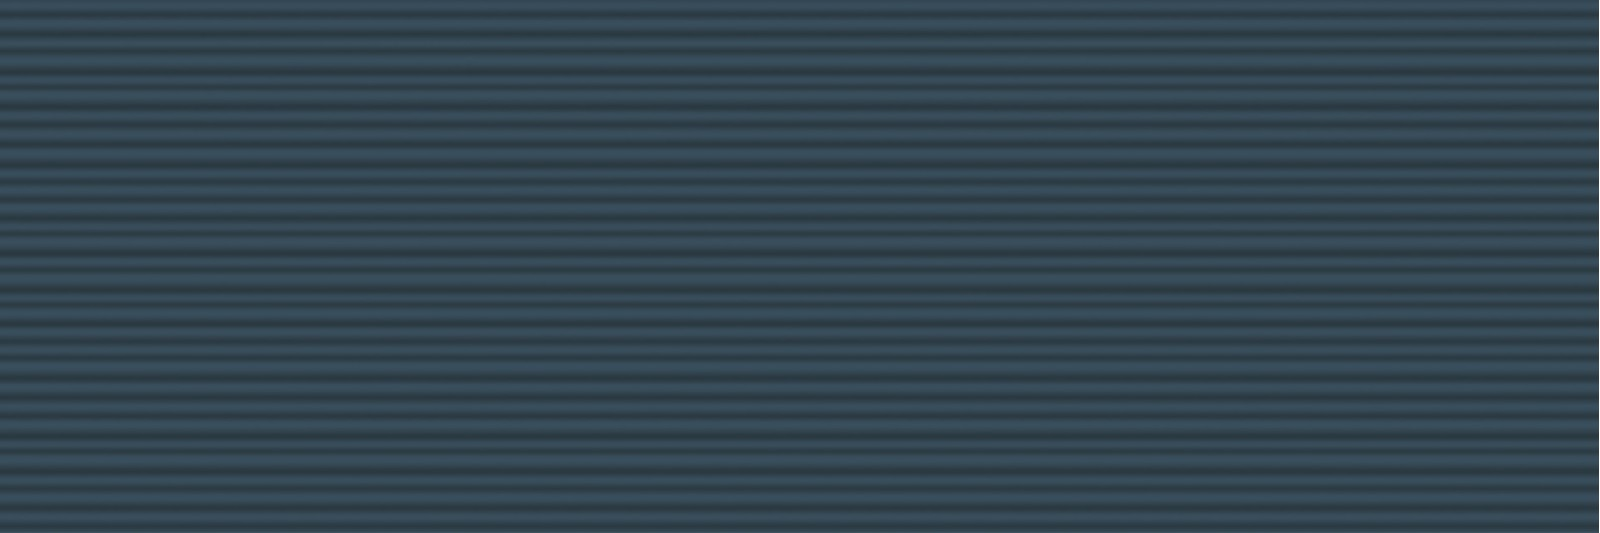 Стенни плочки Colorplay Blue Strutturata Mikado 3D 30x90